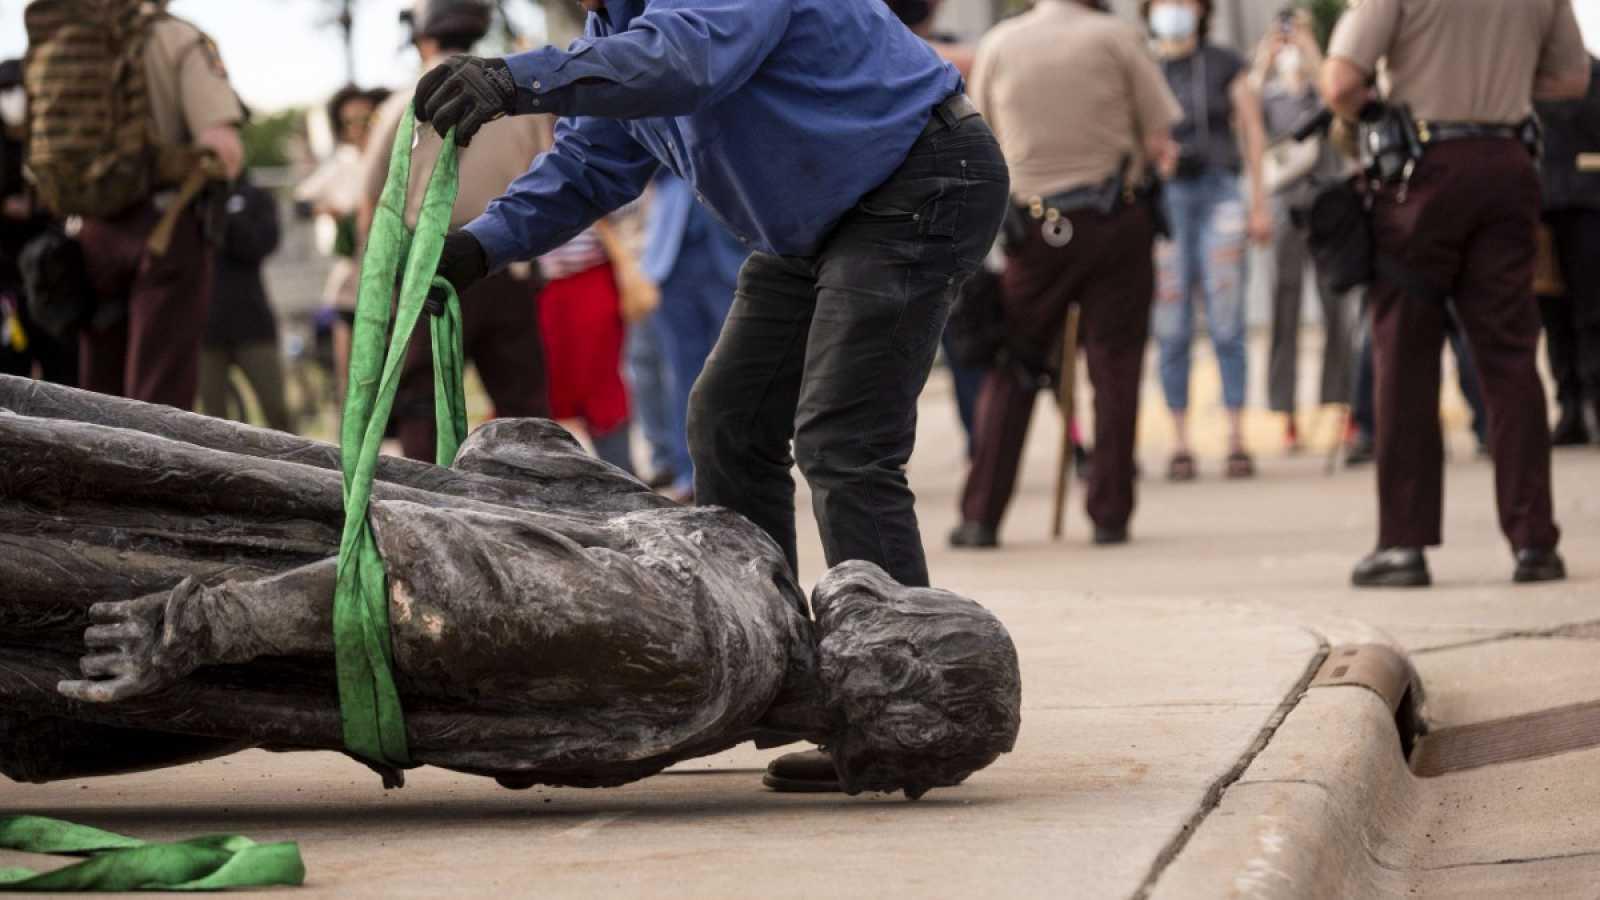 Los manifestantes derriban la estatua de Cristóbal Colón en Saint Paul, Minnesota